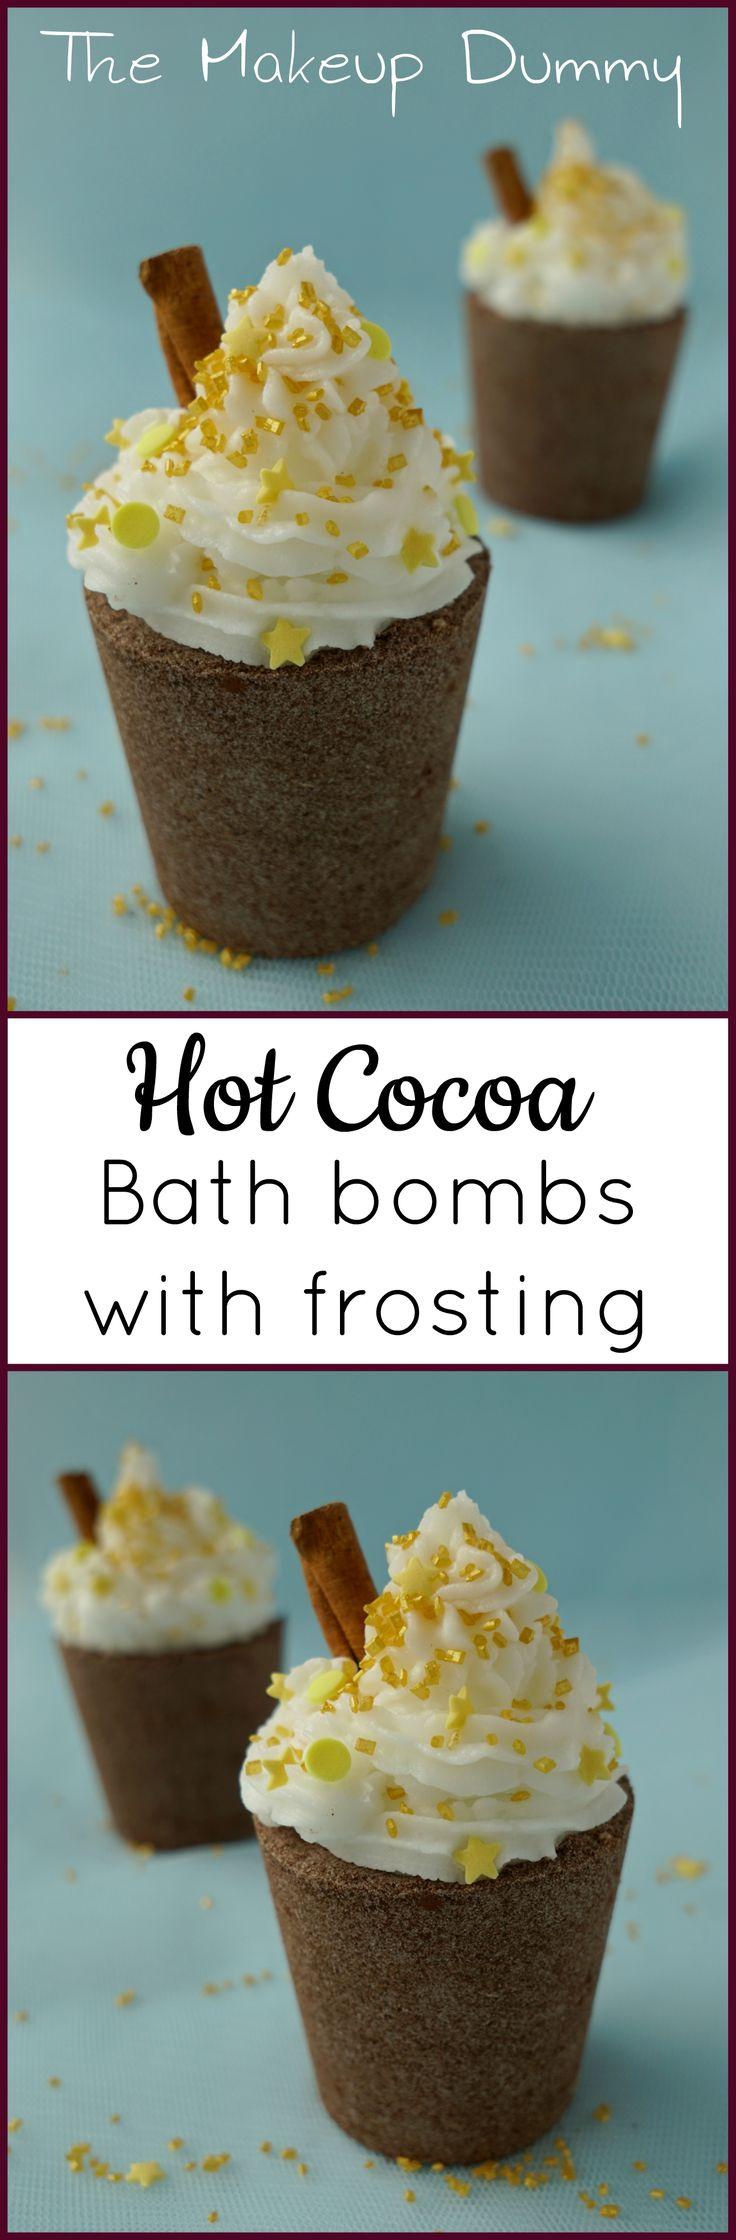 DIY Hot Cocoa Bath Bombs with Frosting Bath bomb recipes